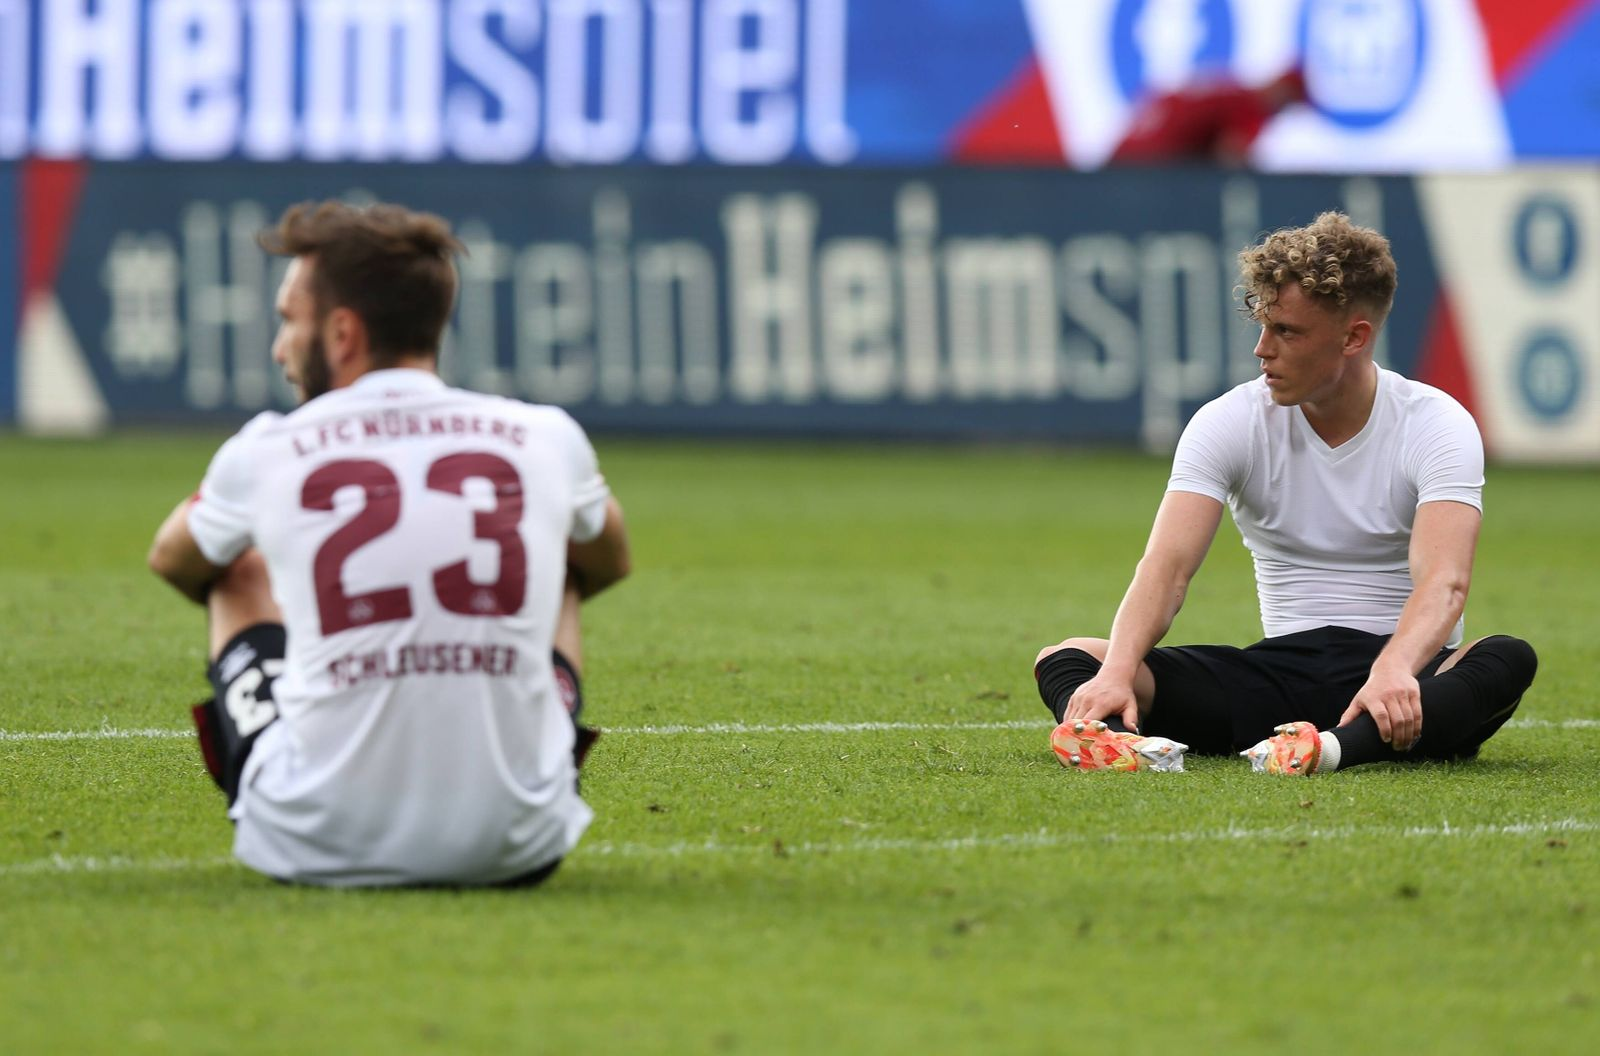 28.06.2020 - Fussball - Saison 2019 2020 - 2. Fussball - Bundesliga - 34. Spieltag: SV Holstein Kiel KSV ( Störche ) -